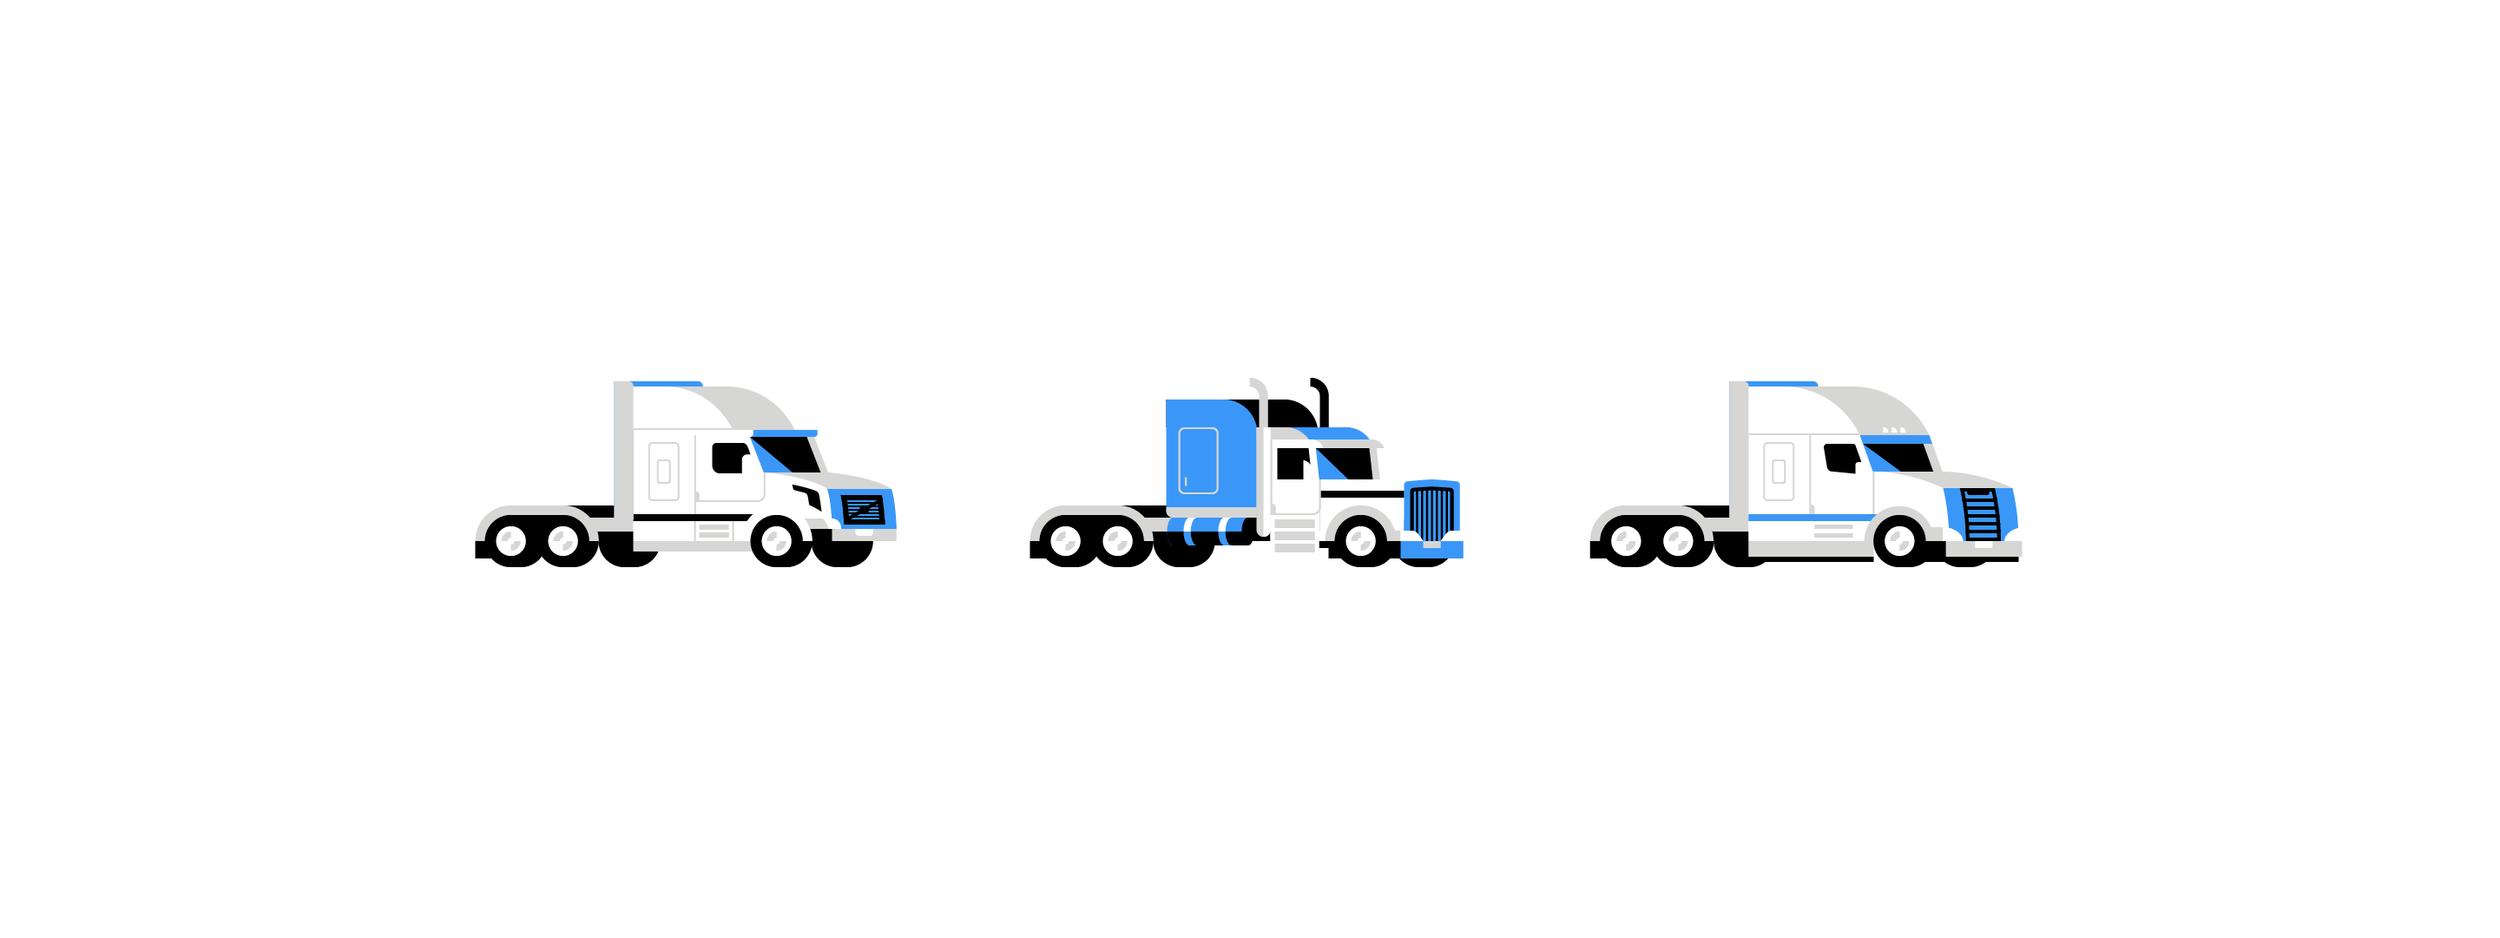 UBF_Images_Trucks.png